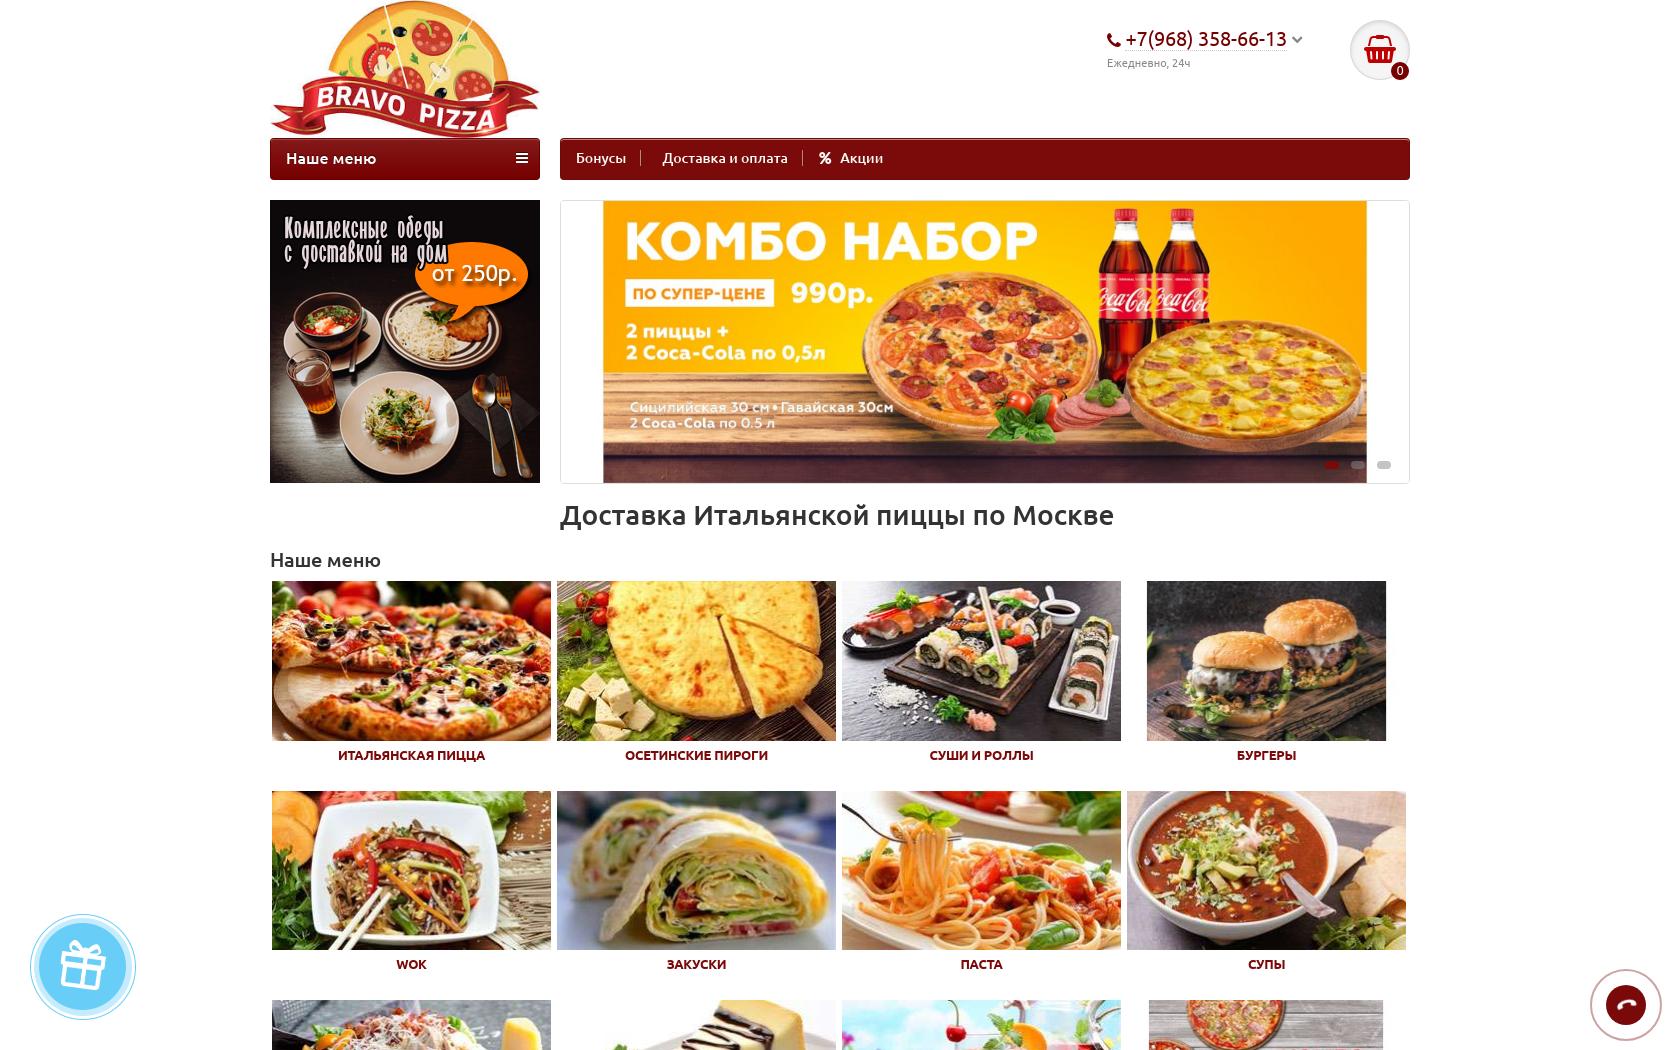 Bravo Pizza